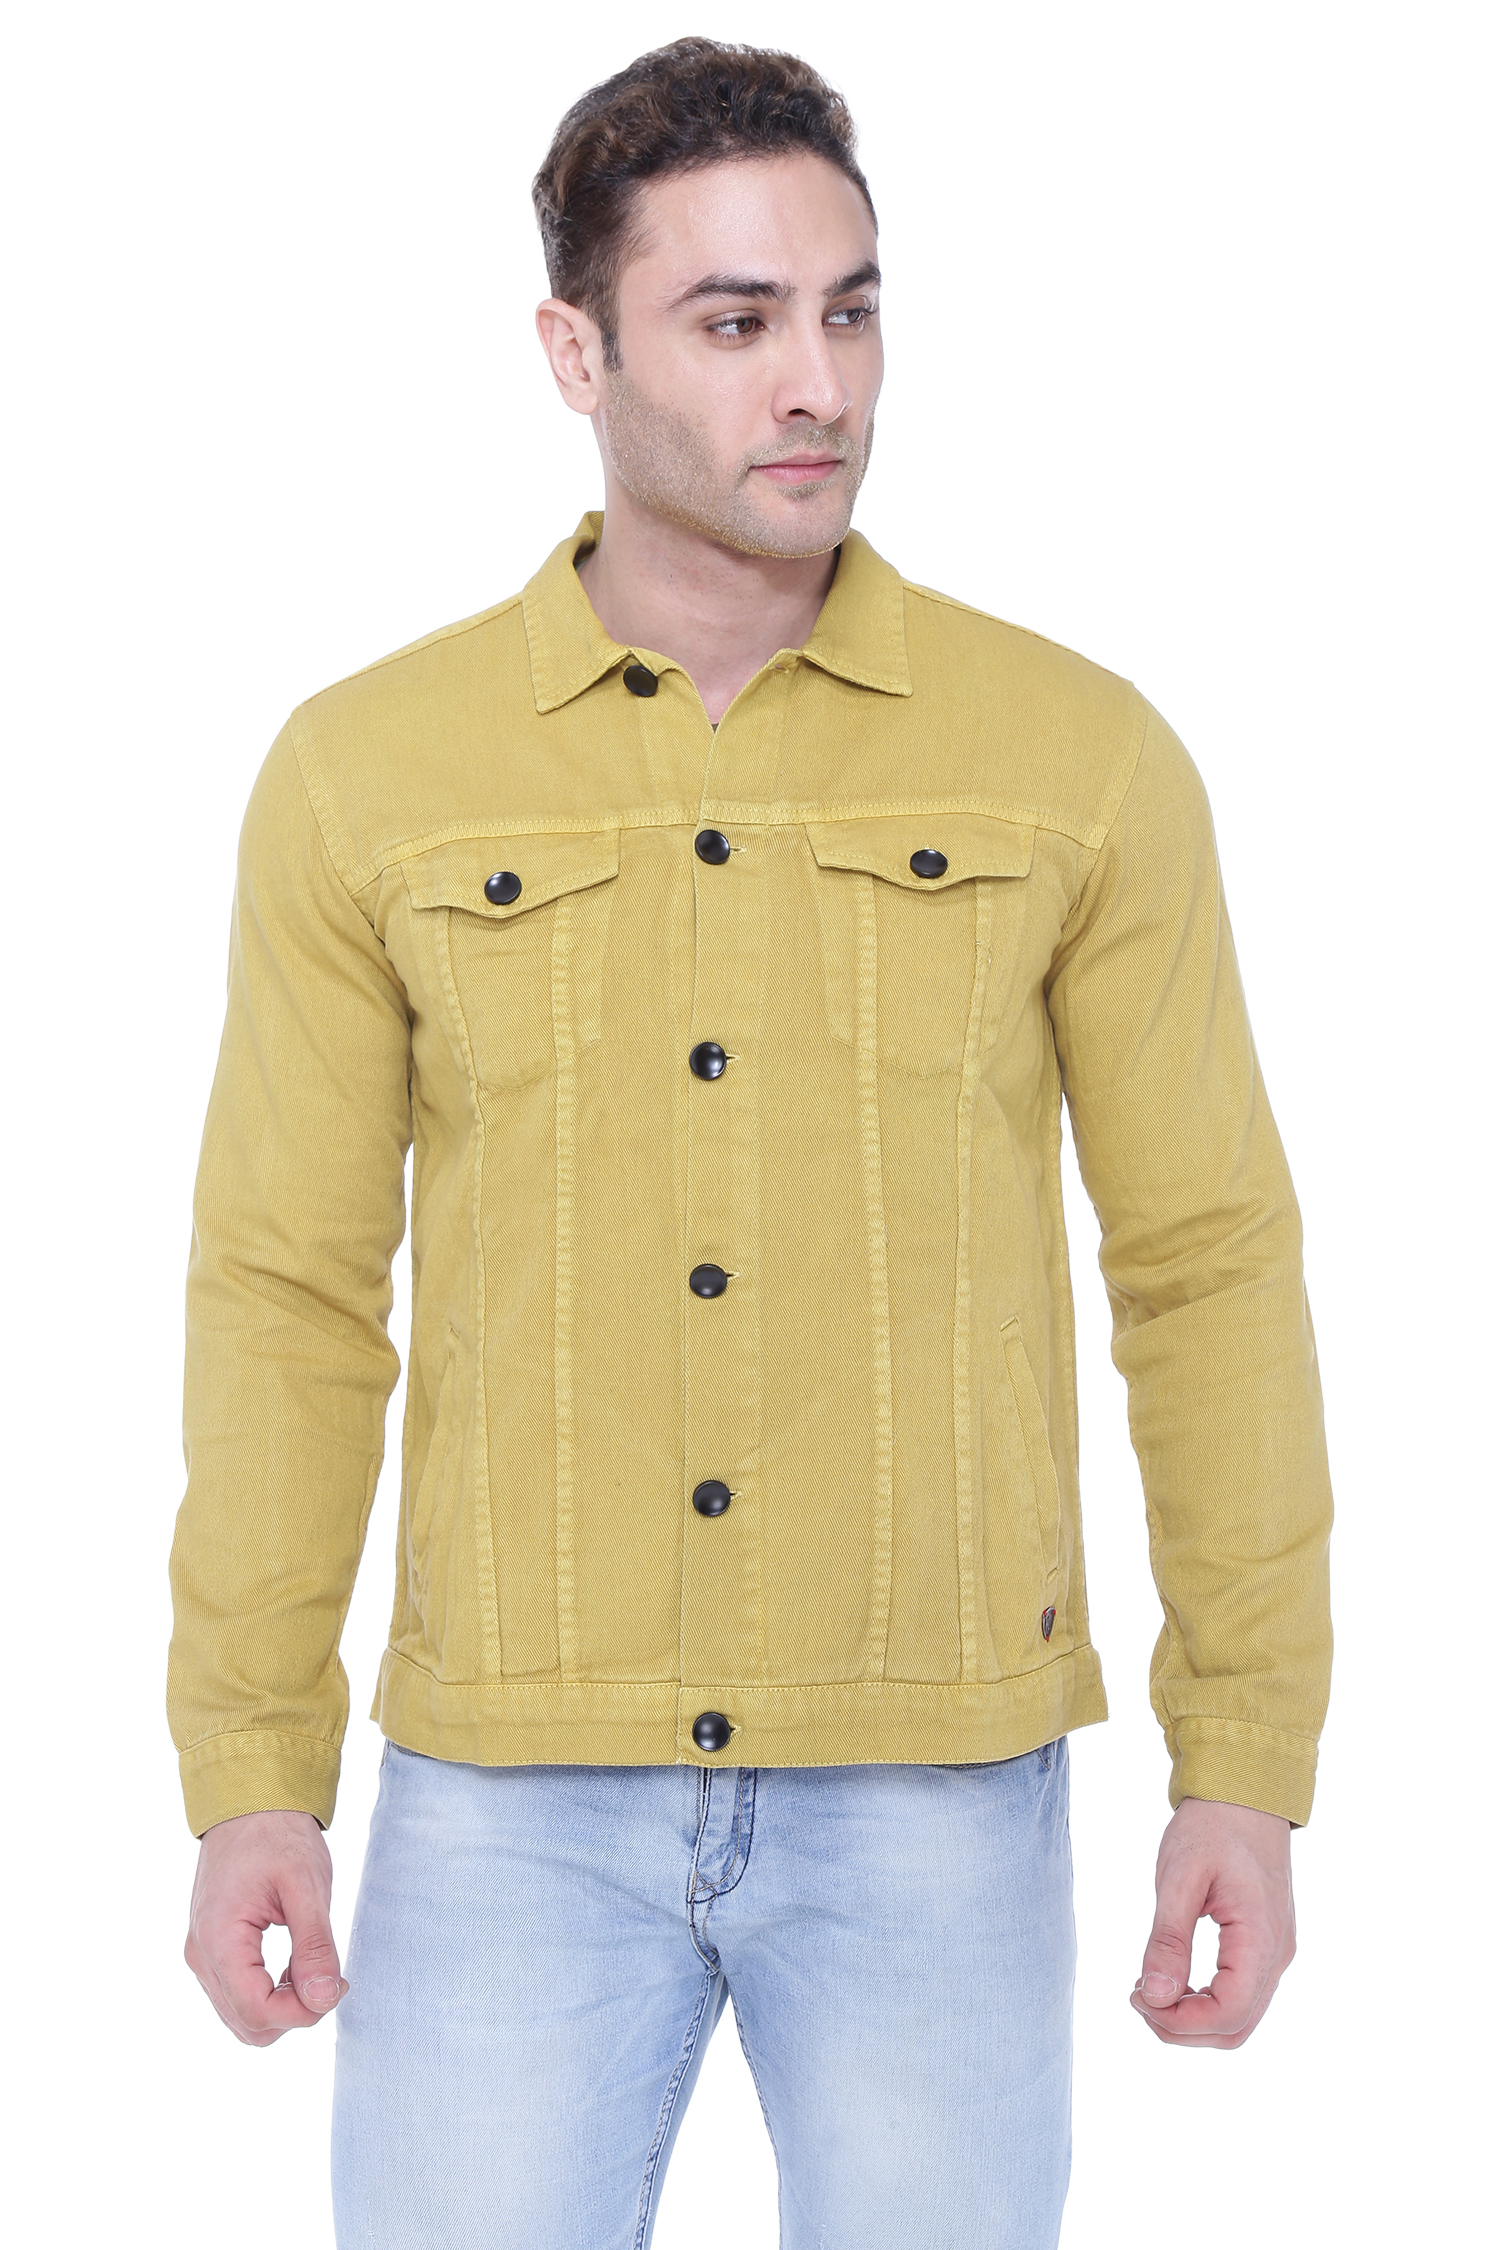 Kuons Avenue | Kuons Avenue Men's Khaki Denim Jacket- KACLFS1364KH